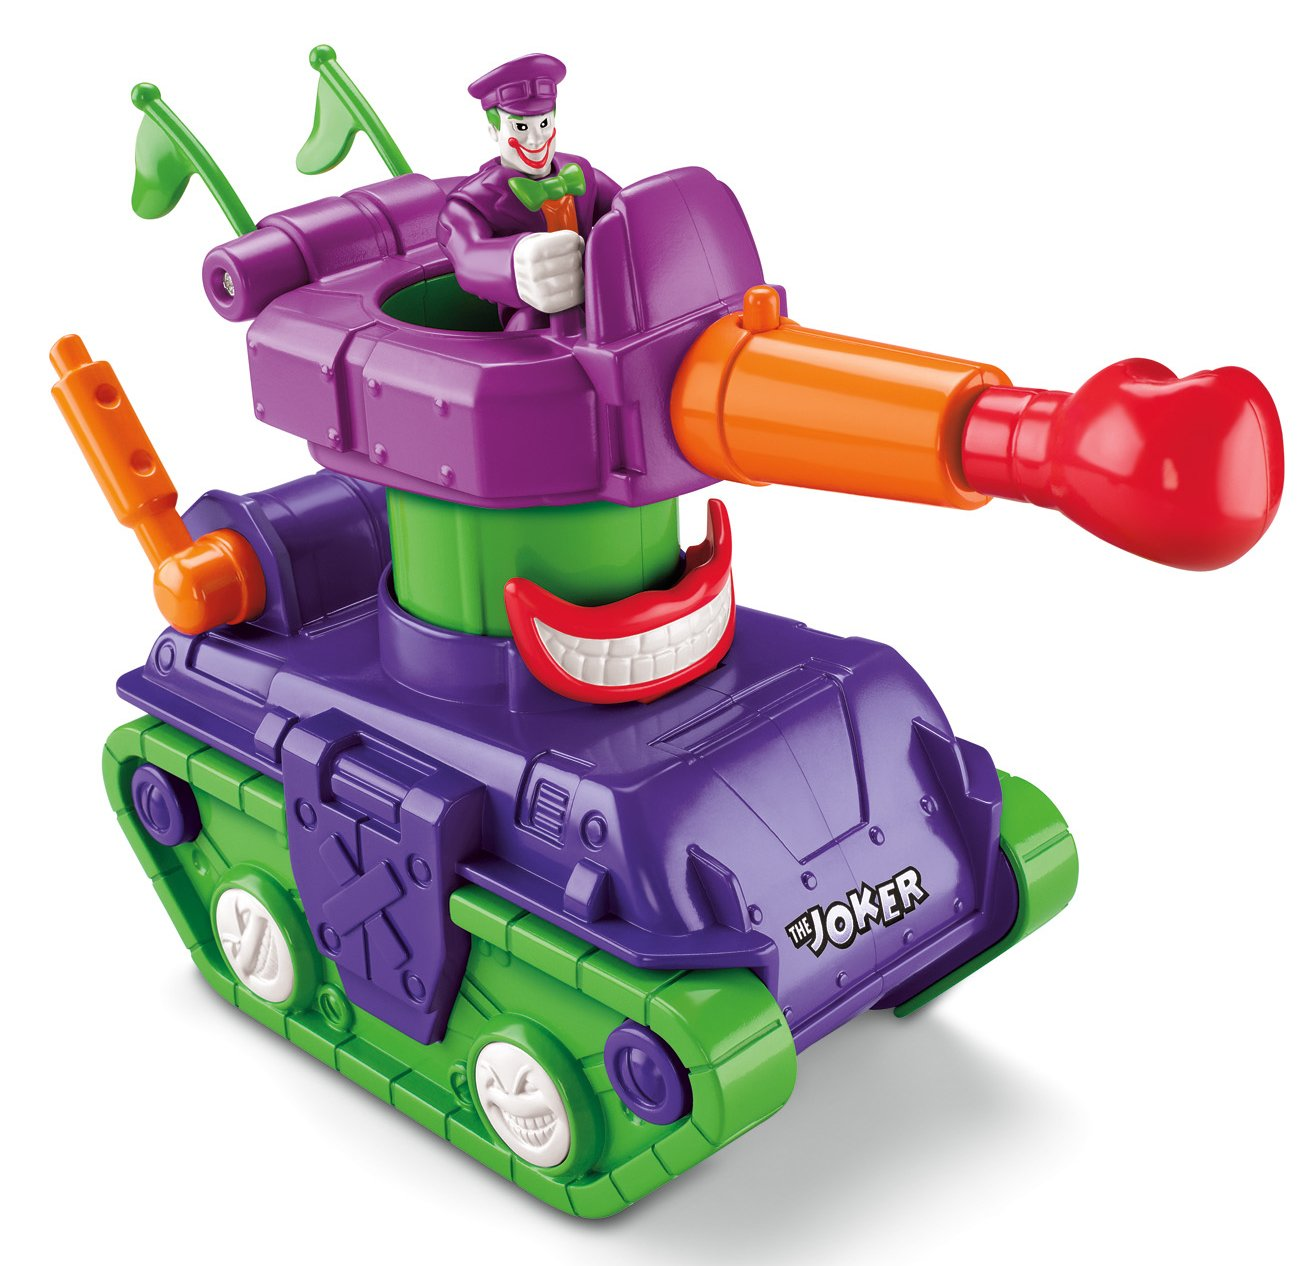 Fisher-Price Imaginext DC Super Friends Joker Tank Fisher Price W9540